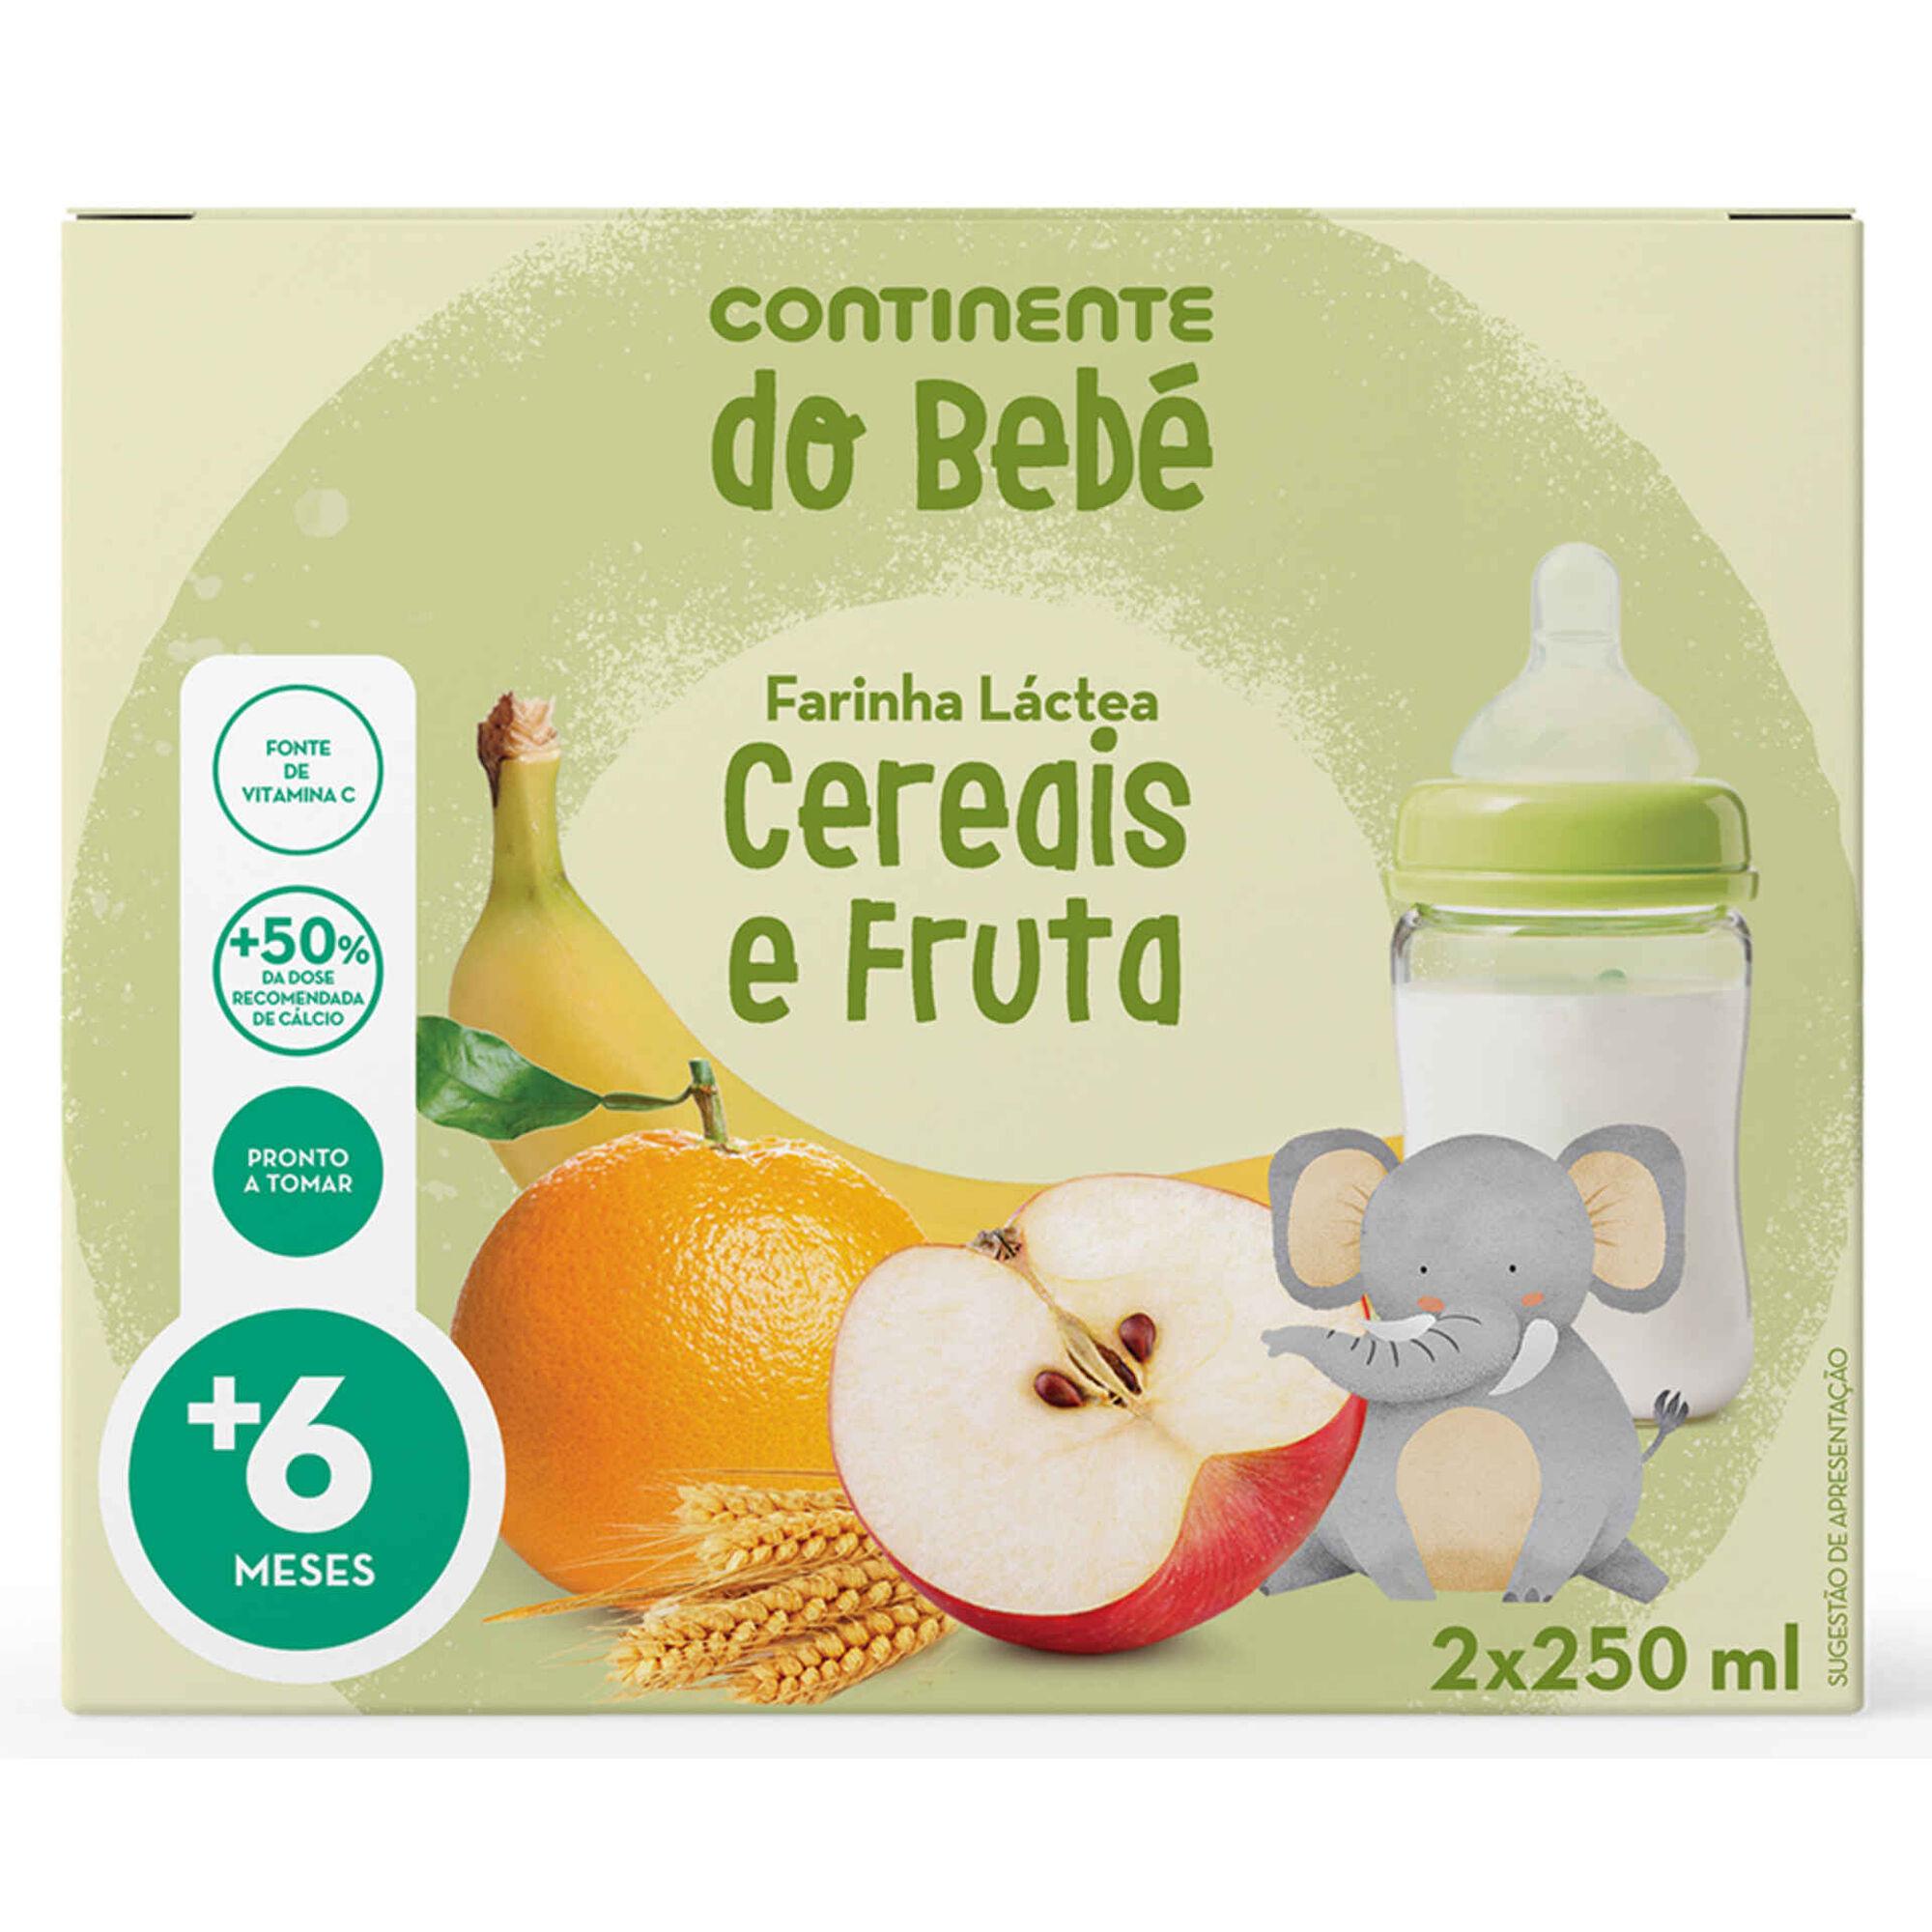 Papa Infantil Farinha Láctea Cereais e Fruta +6 Meses